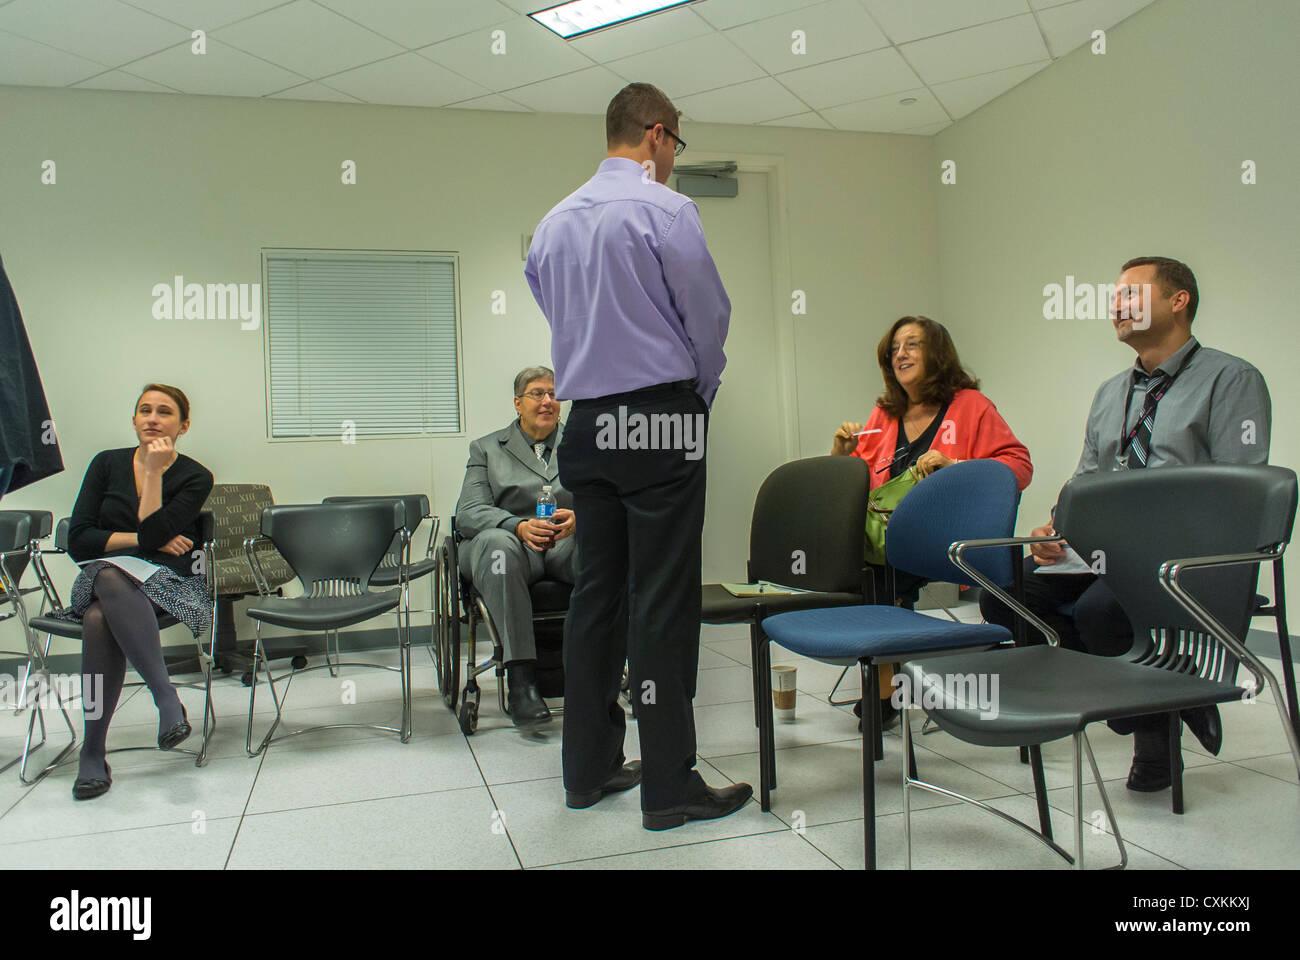 Nueva York, SIDA, Asociación Gay Men's Health Crisis (GMHC), Reunión Obamacare, Ley de atención Imagen De Stock